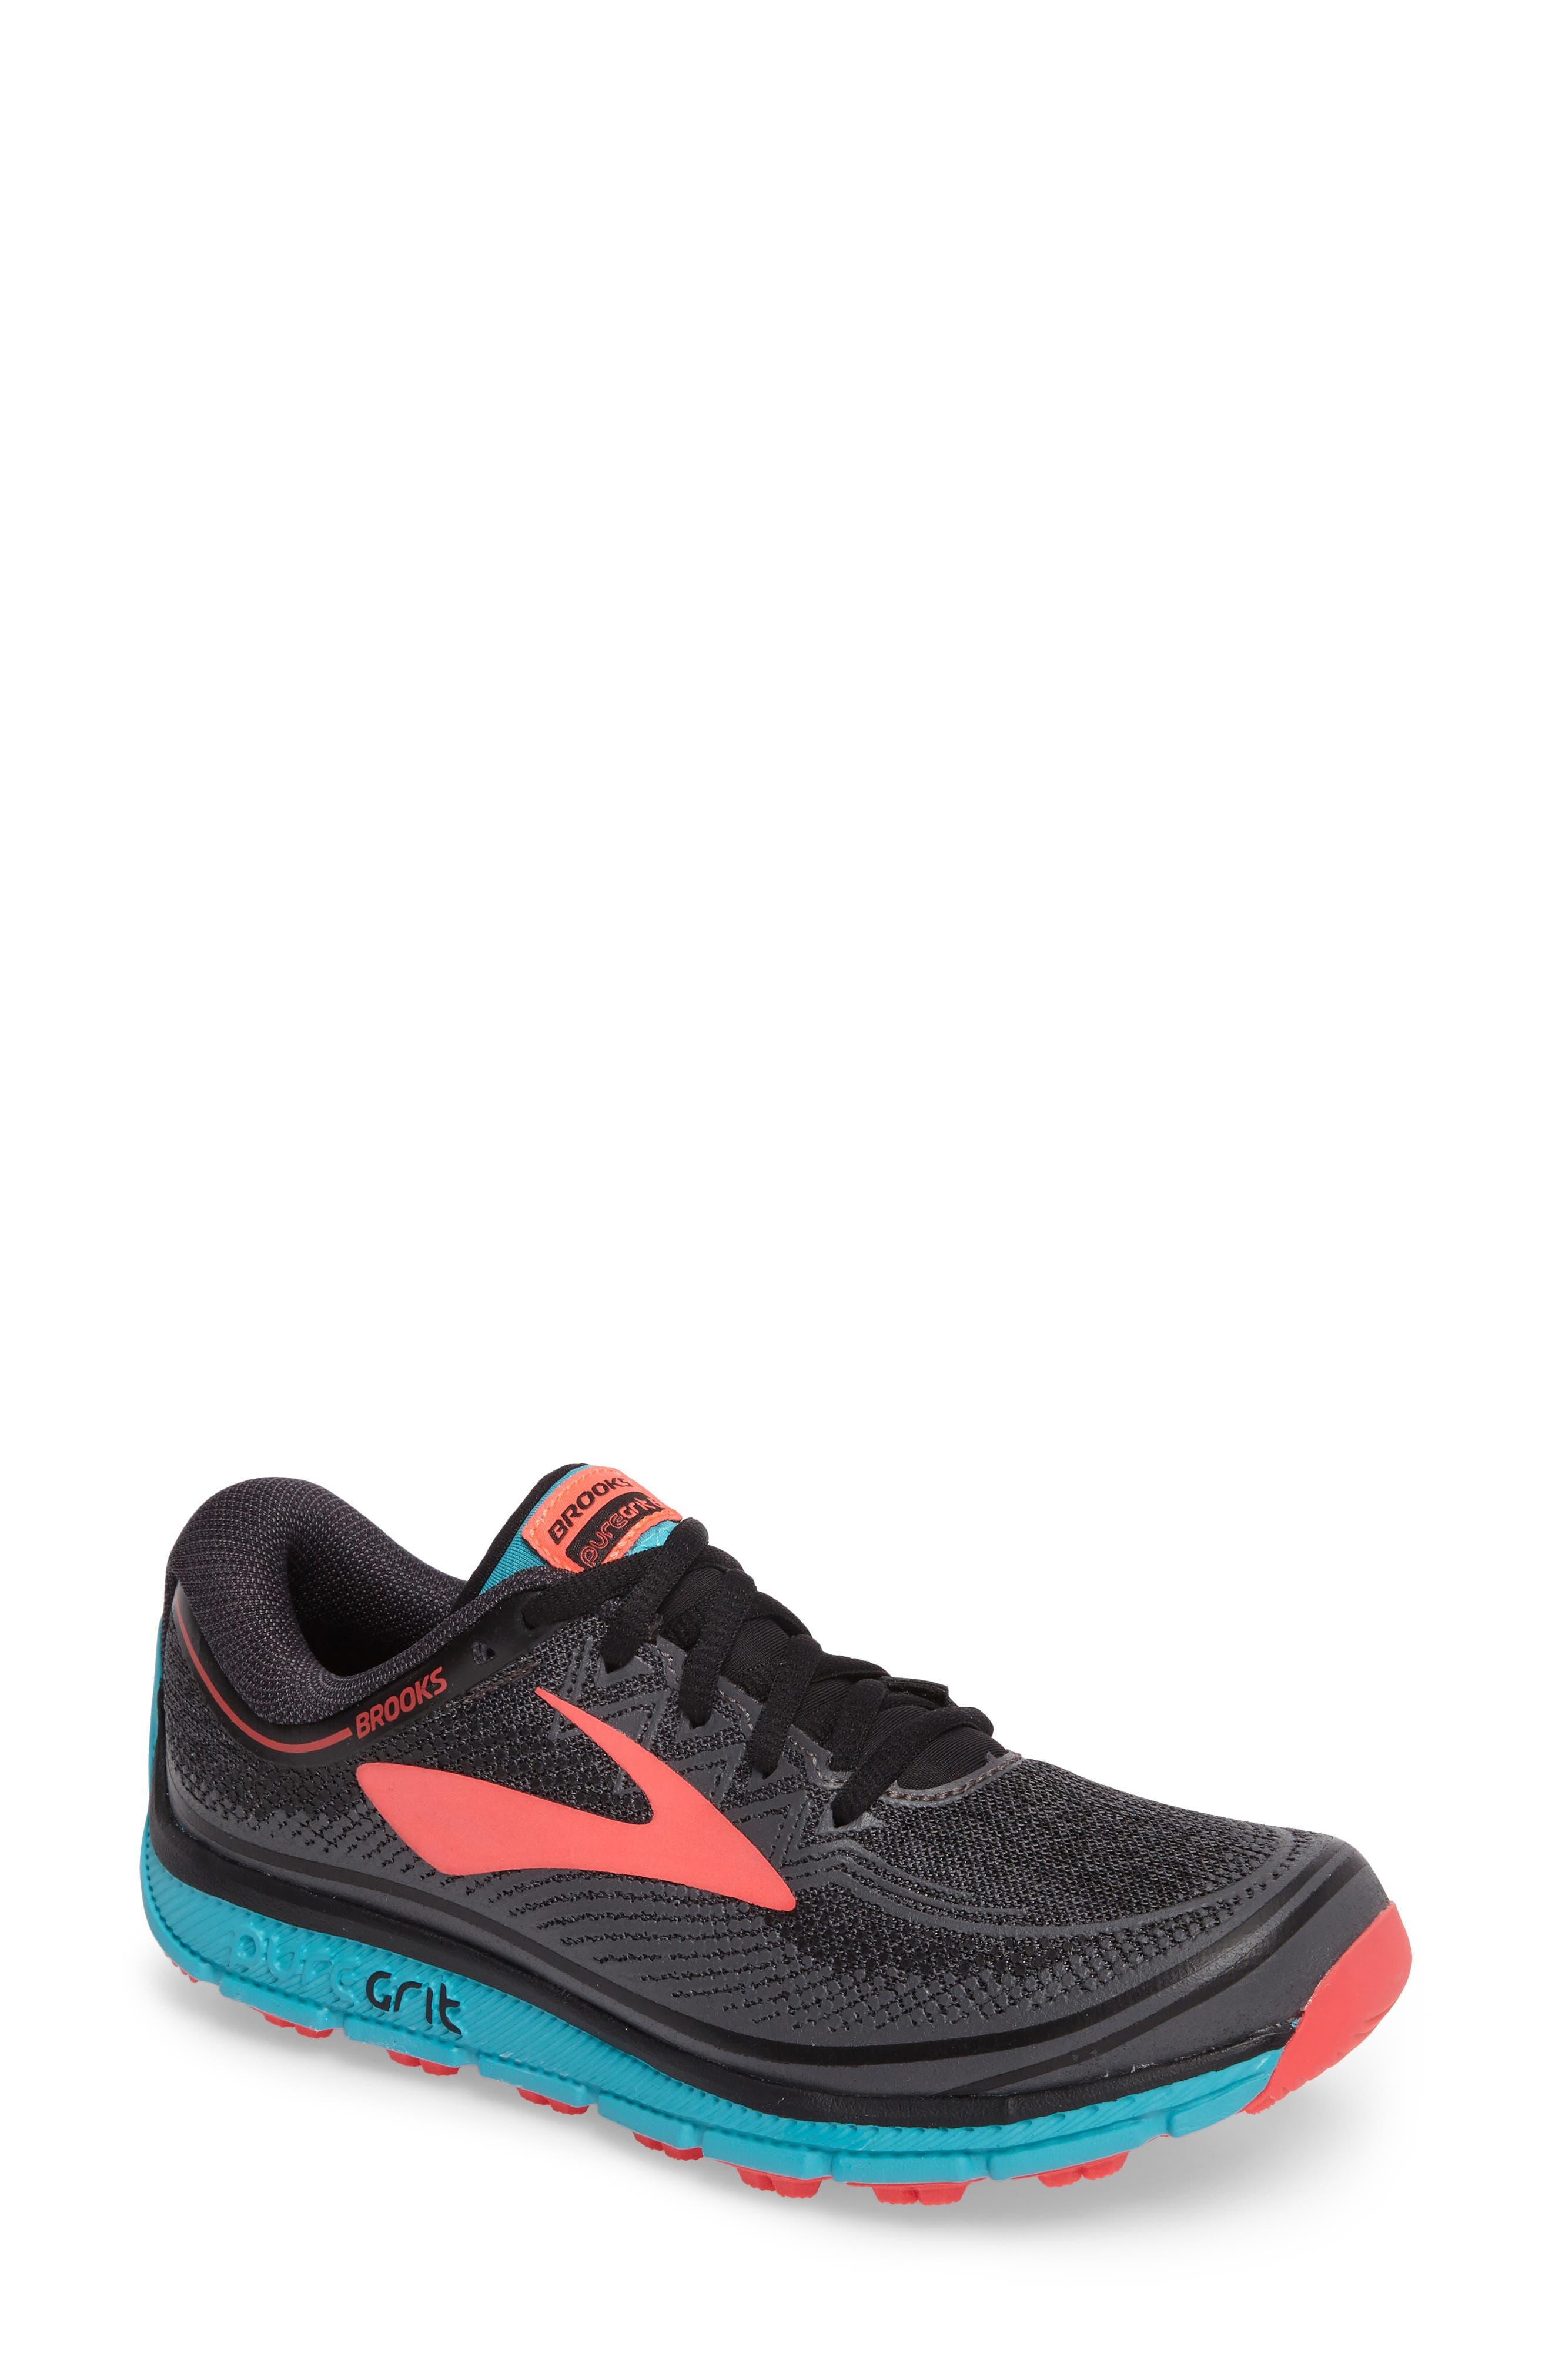 PureGrit 6 Trail Running Shoe,                             Main thumbnail 1, color,                             014